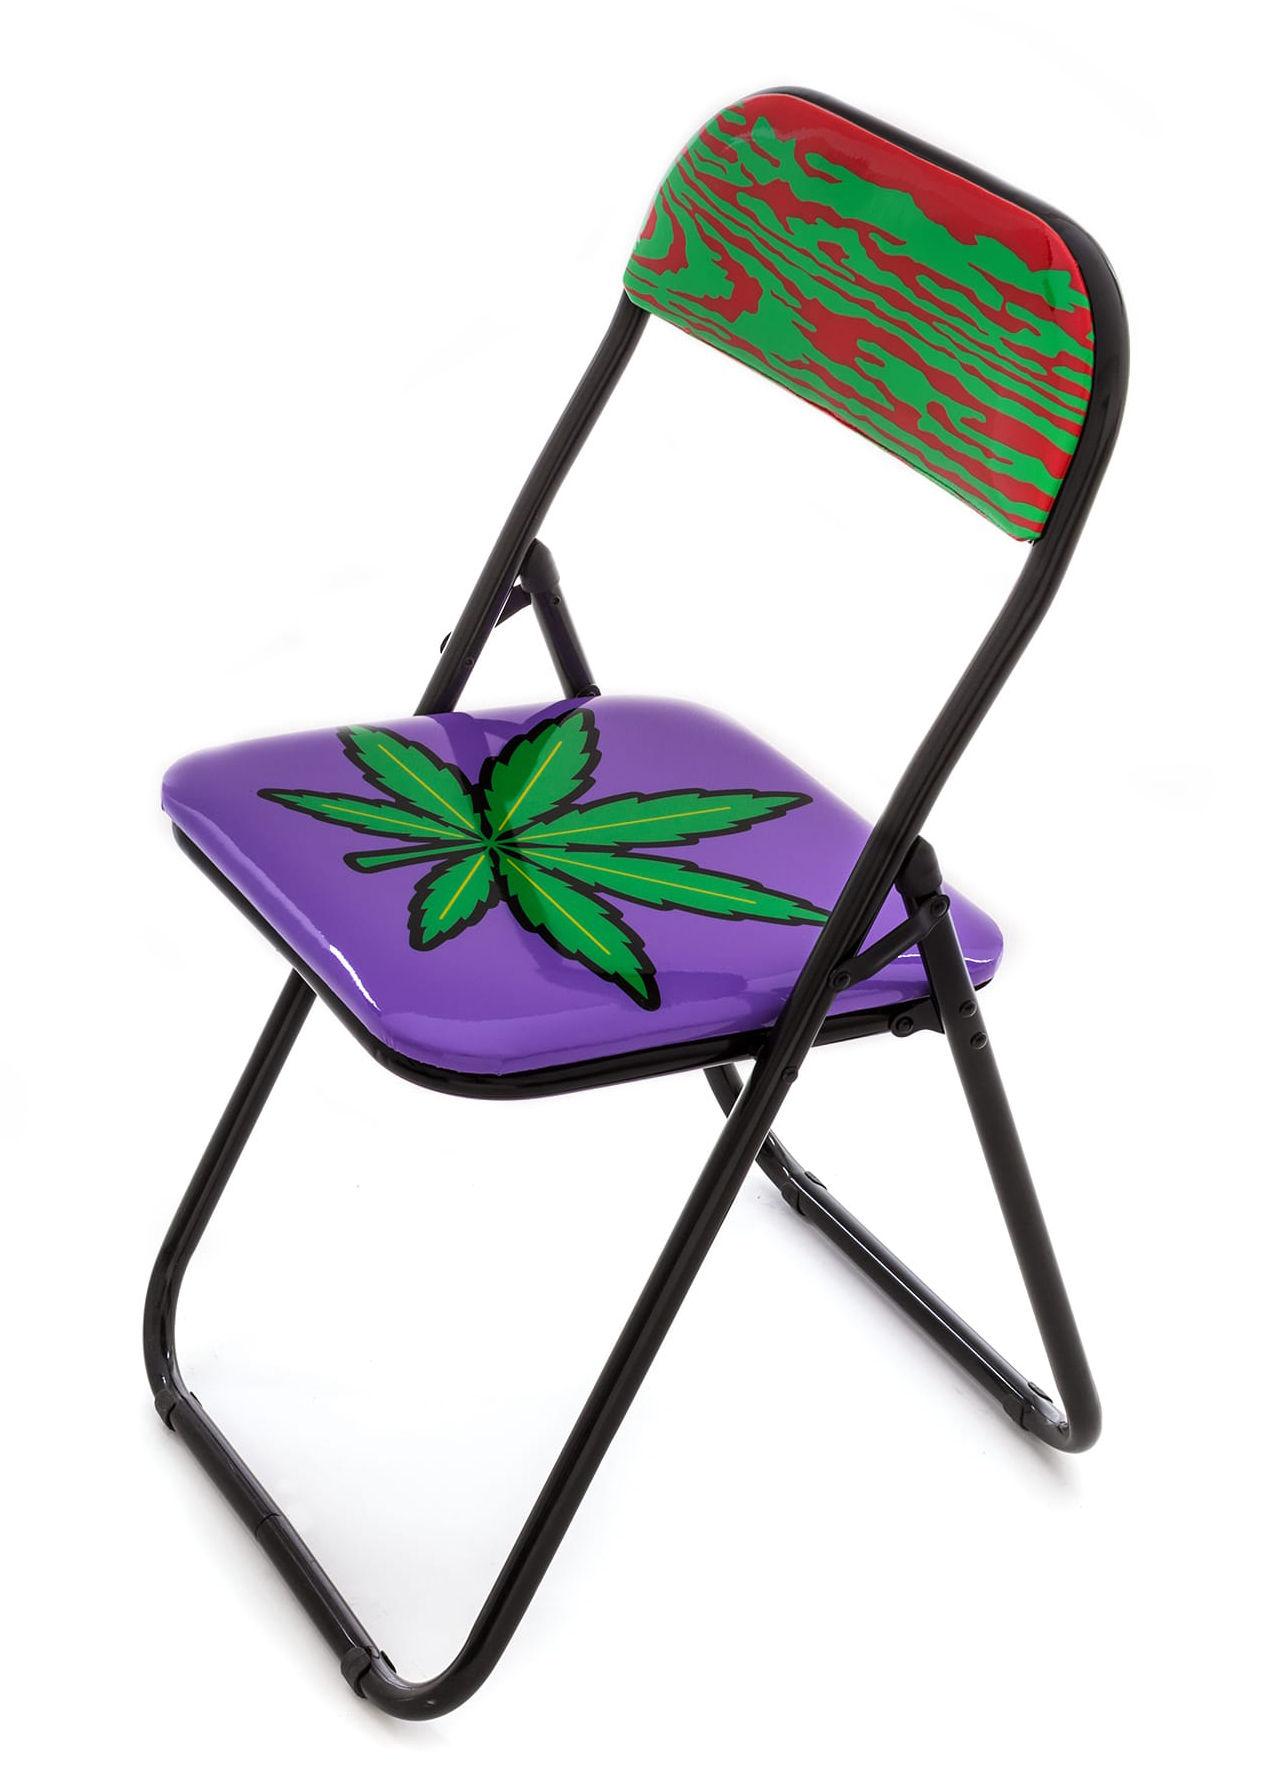 weed gepolstert seletti klappstuhl. Black Bedroom Furniture Sets. Home Design Ideas